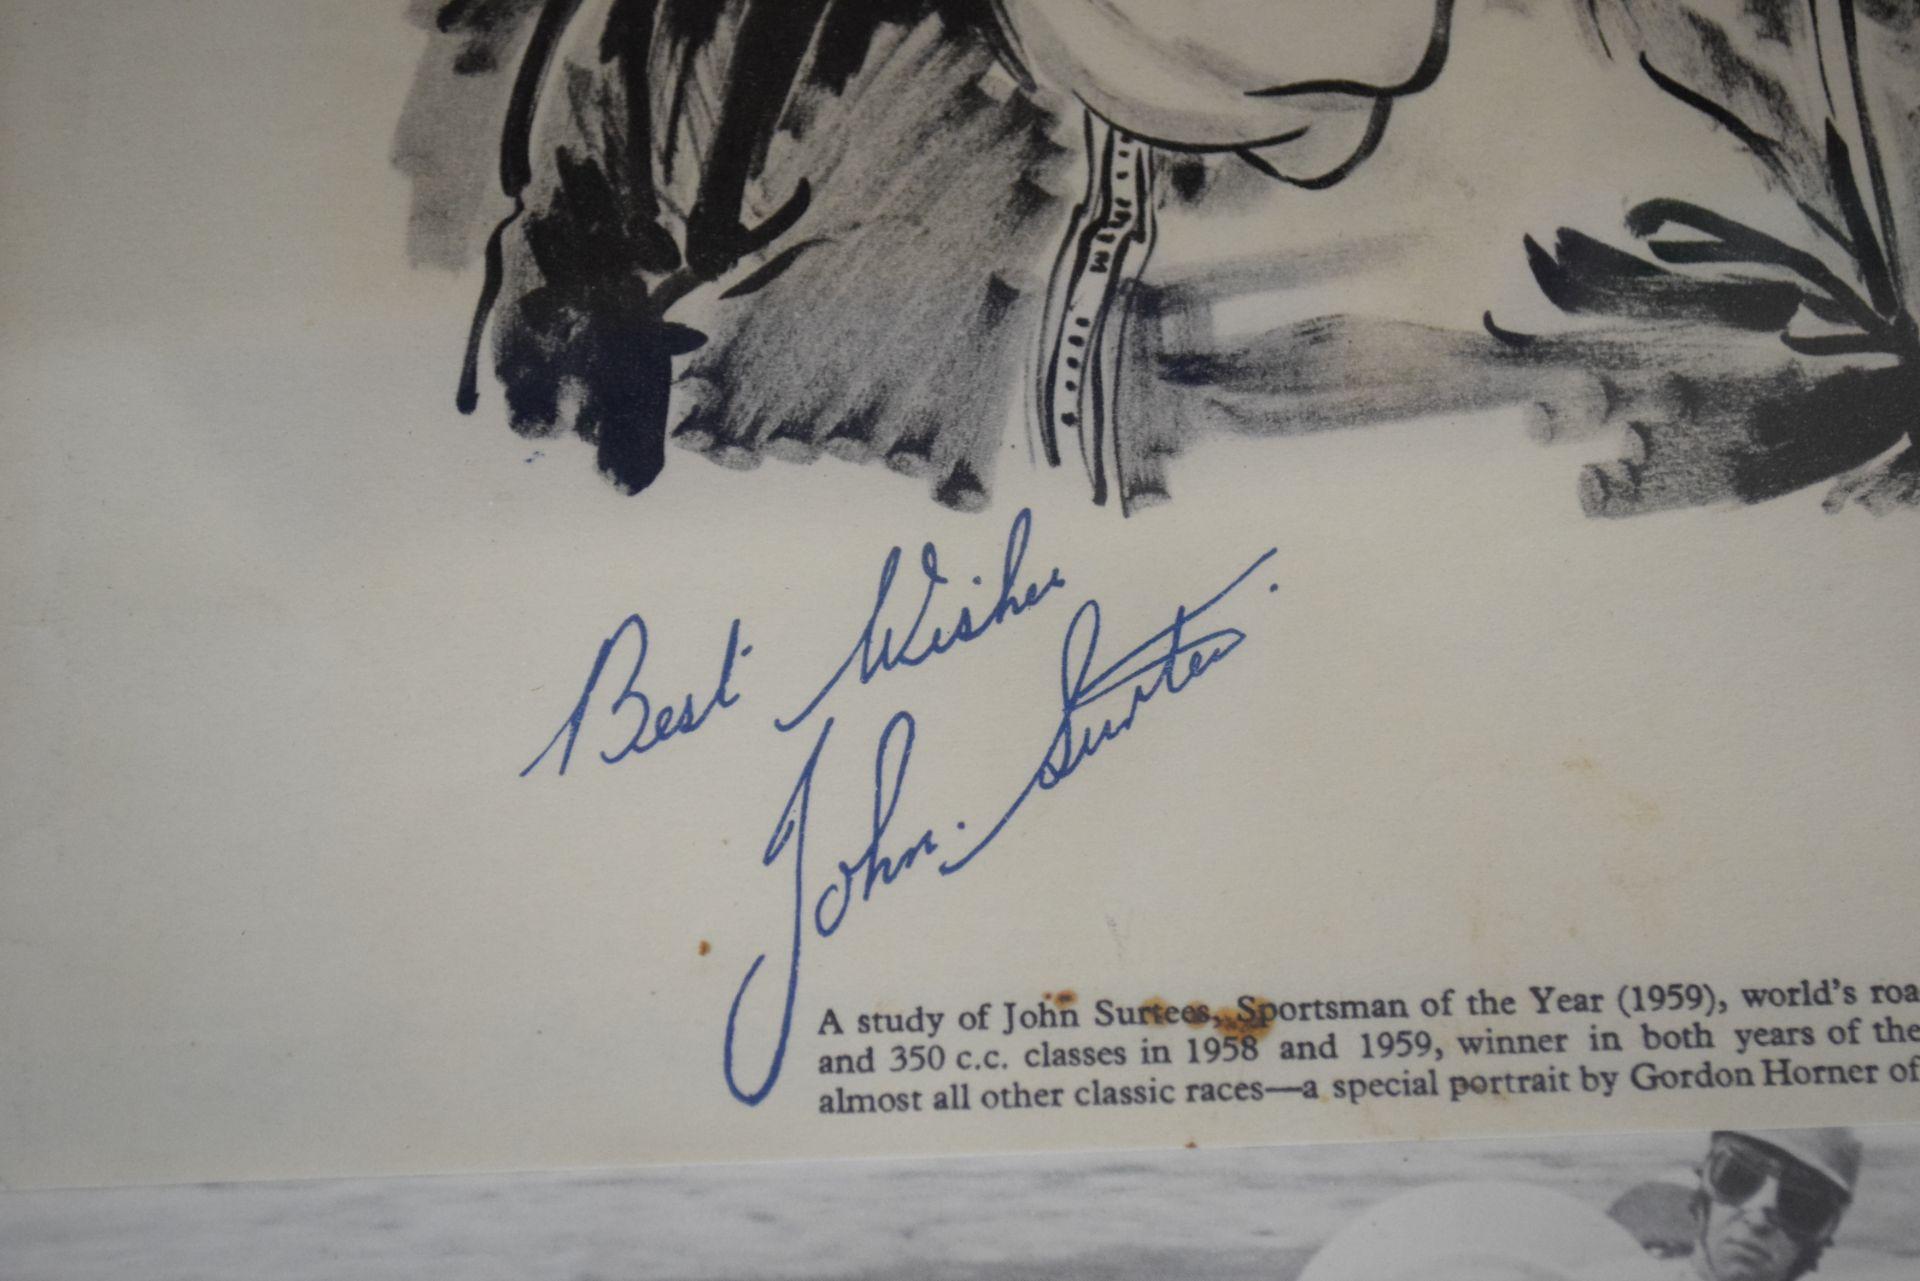 Print of John Surtees, Sportsman of the Year 1959 - Image 2 of 2